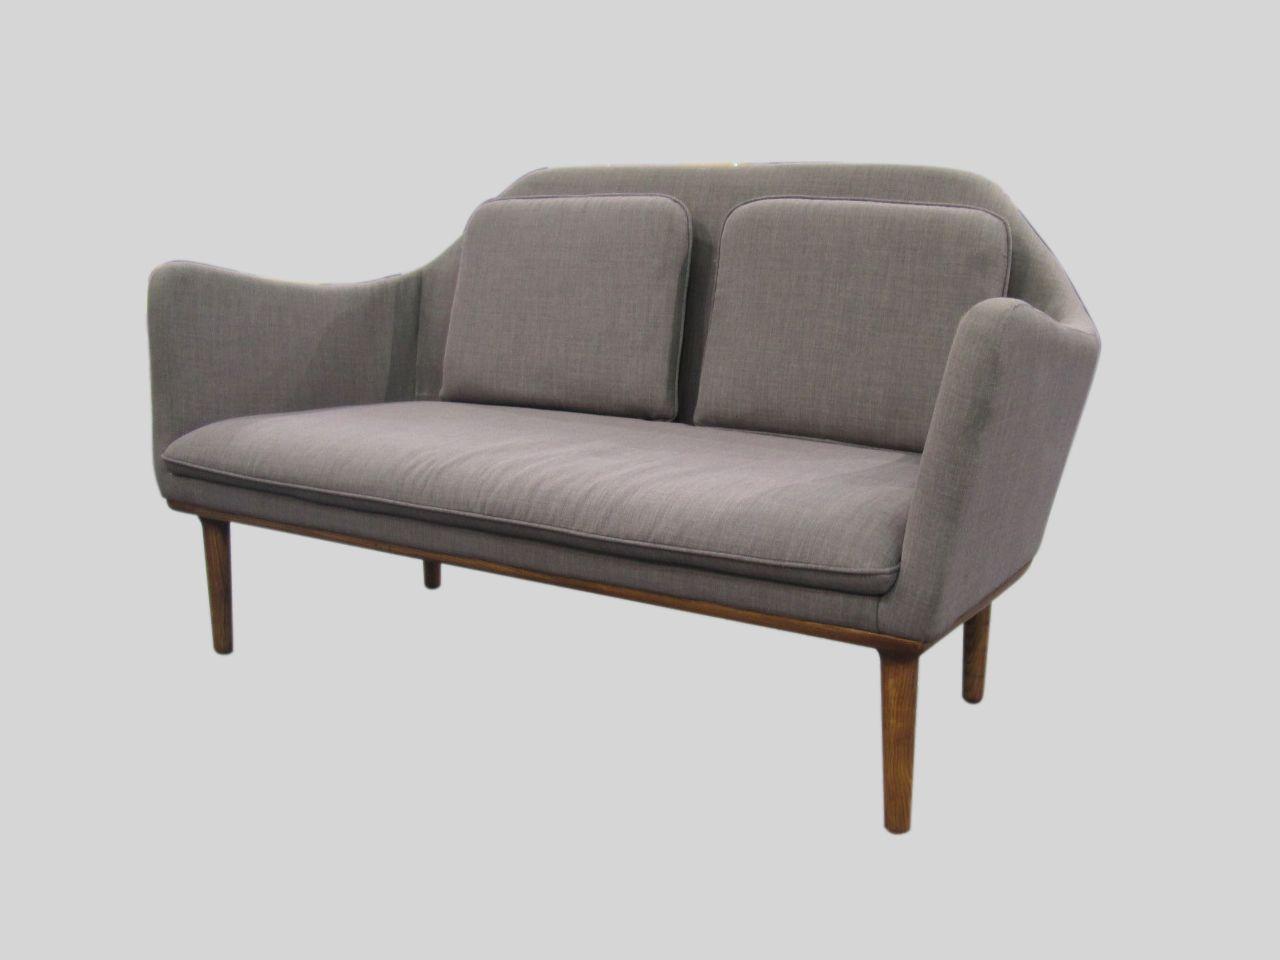 seth sofa comfort design the chair table peoplecomfort design rh pinterest com